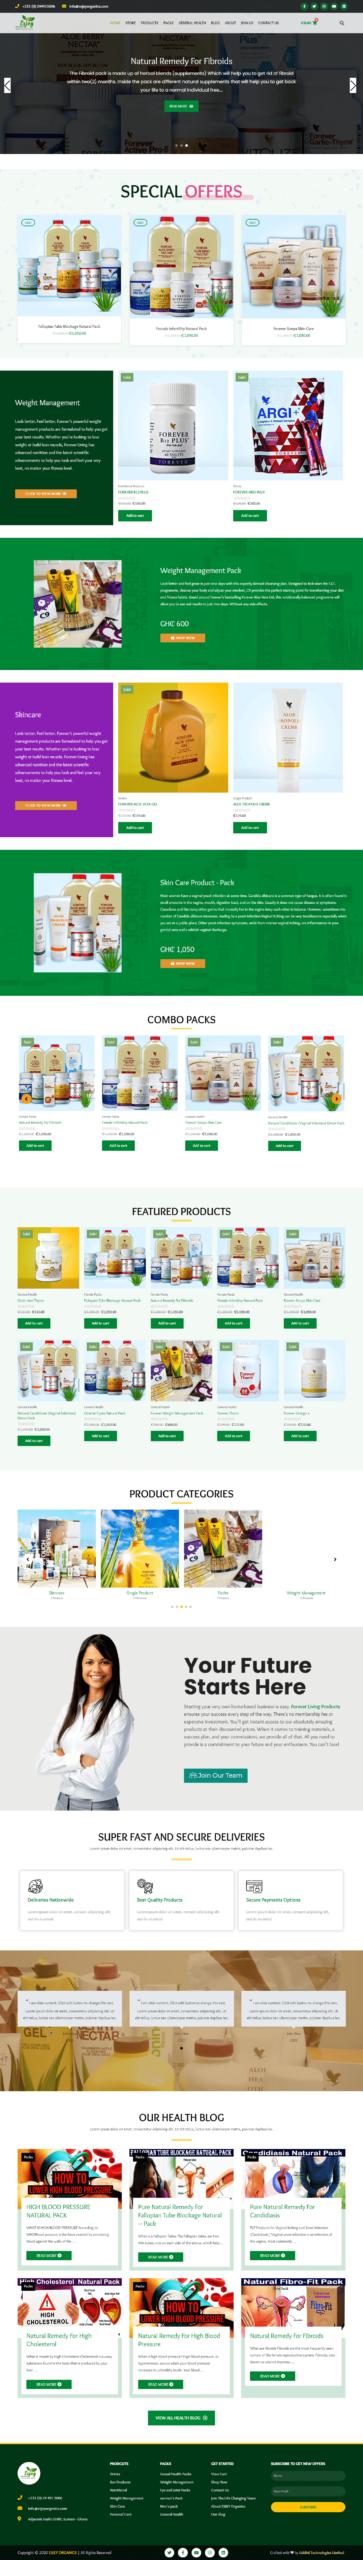 An Ecommerce Organic Online Shop | Uddfel Technologies Limited